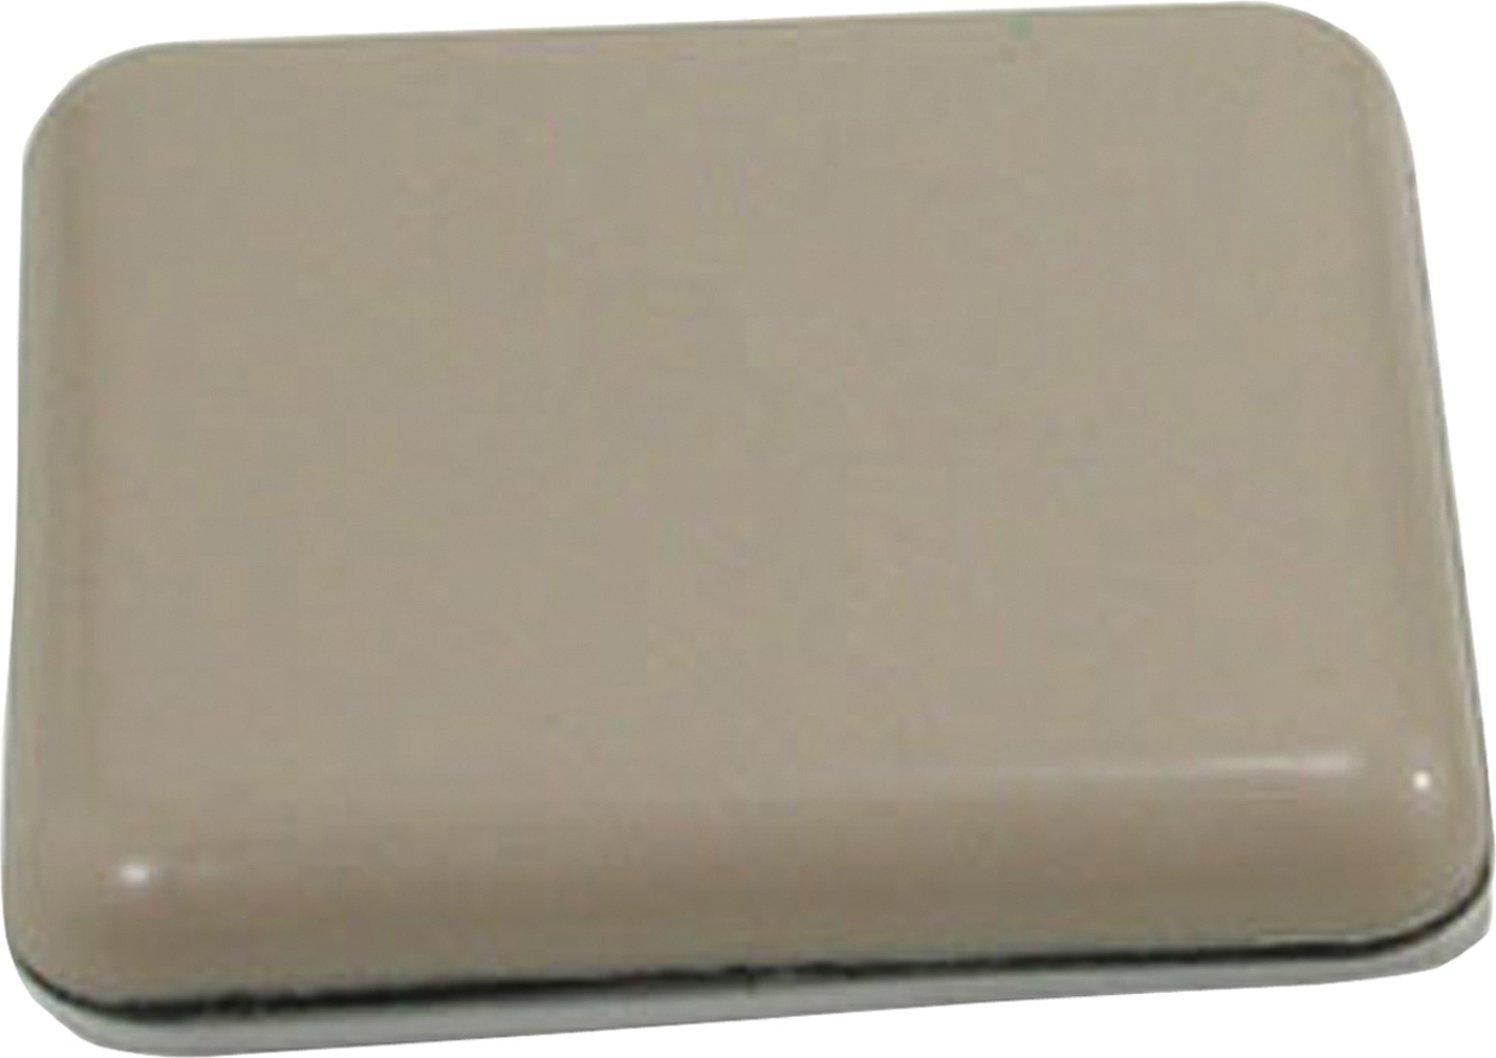 Beau Amazon.com: Shepherd Hardware 3949 2 Inch Adhesive, Square, Slide Glide  Furniture Sliders, 4 Pack: Home Improvement